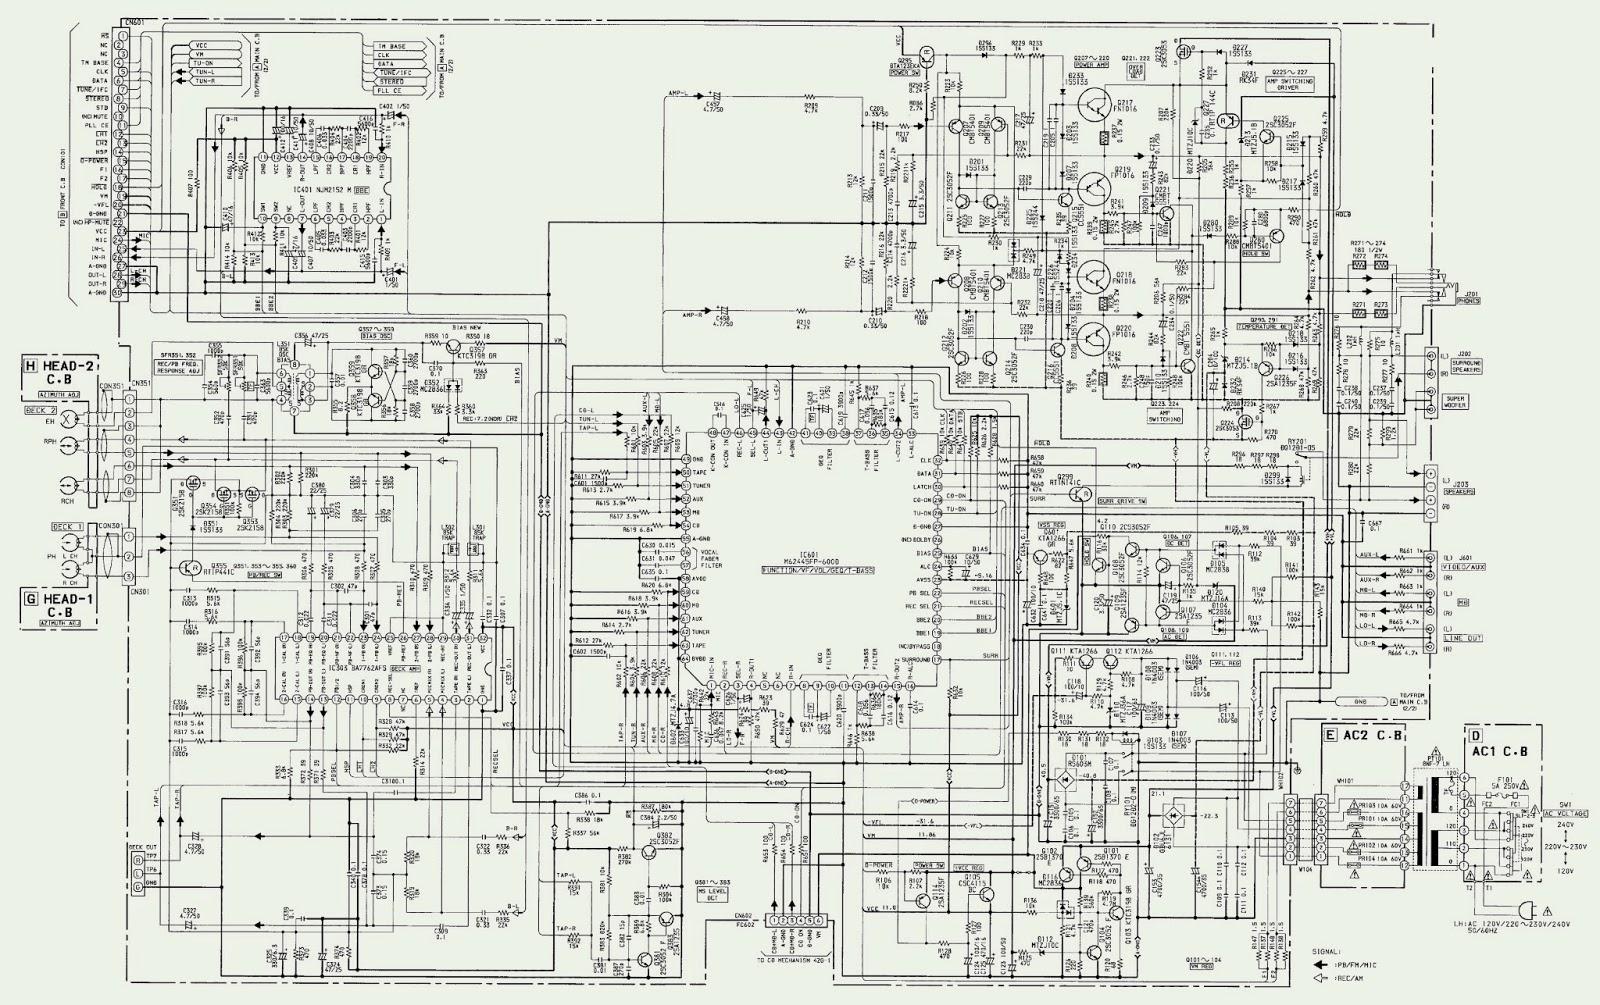 [DIAGRAM_38YU]  Electro help: AIWA NSX S509LX – NSX S514EZ - CIRCUIT DIAGRAM (Schematic) -  Compact Disc Stereo Casette Receiver | Aiwa Wiring Diagram |  | Electro help - blogger